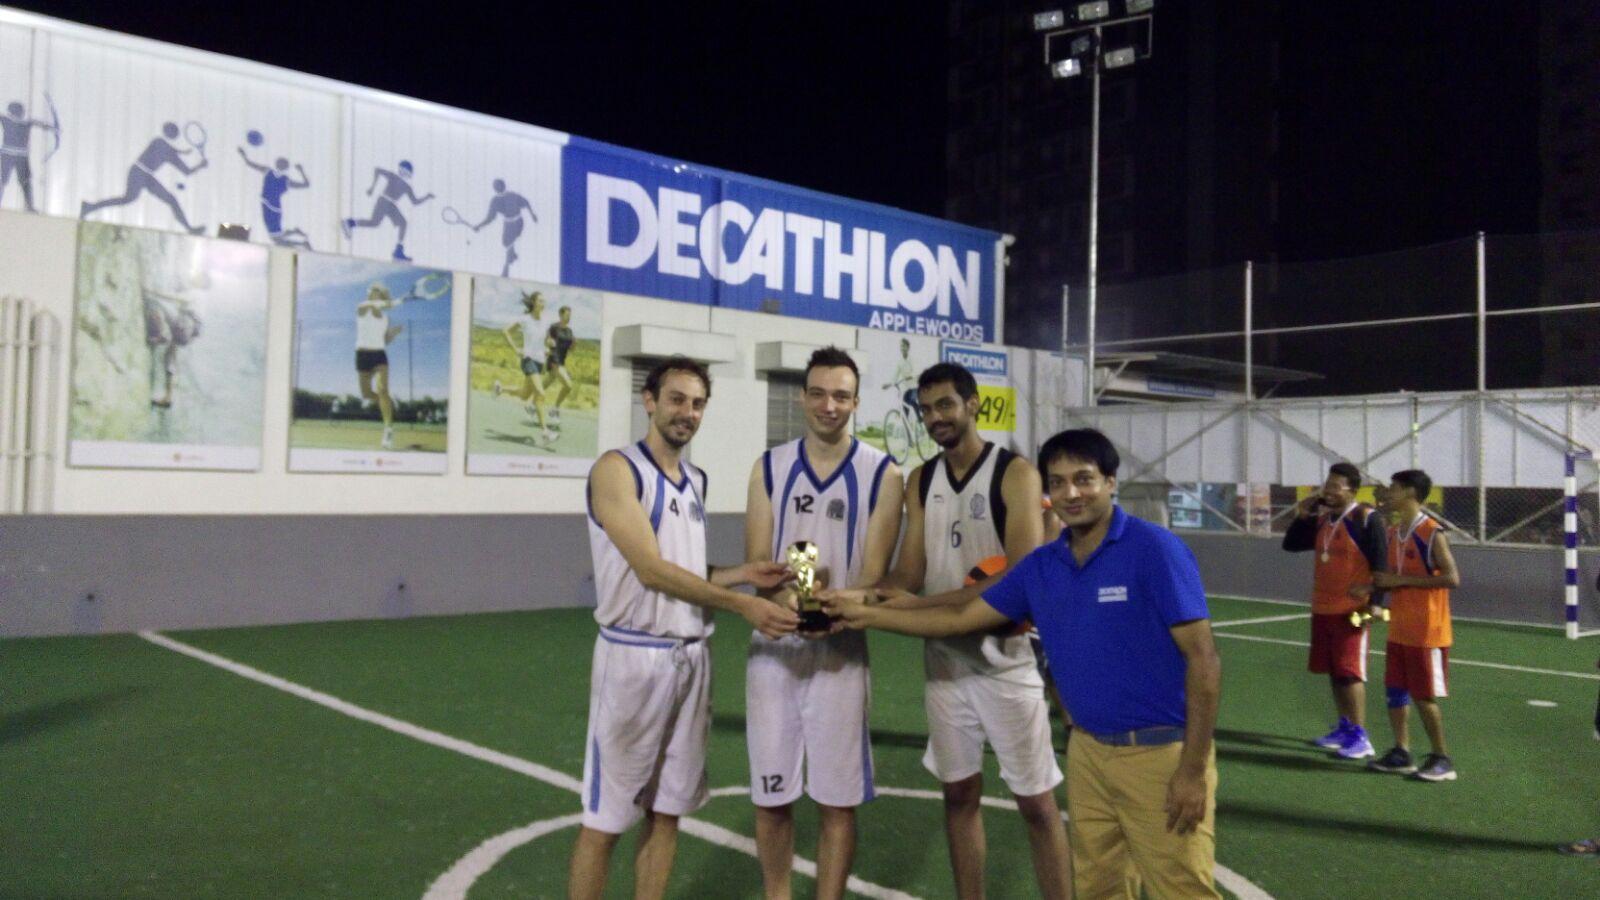 Decathlon's Event starts Tomorrow!